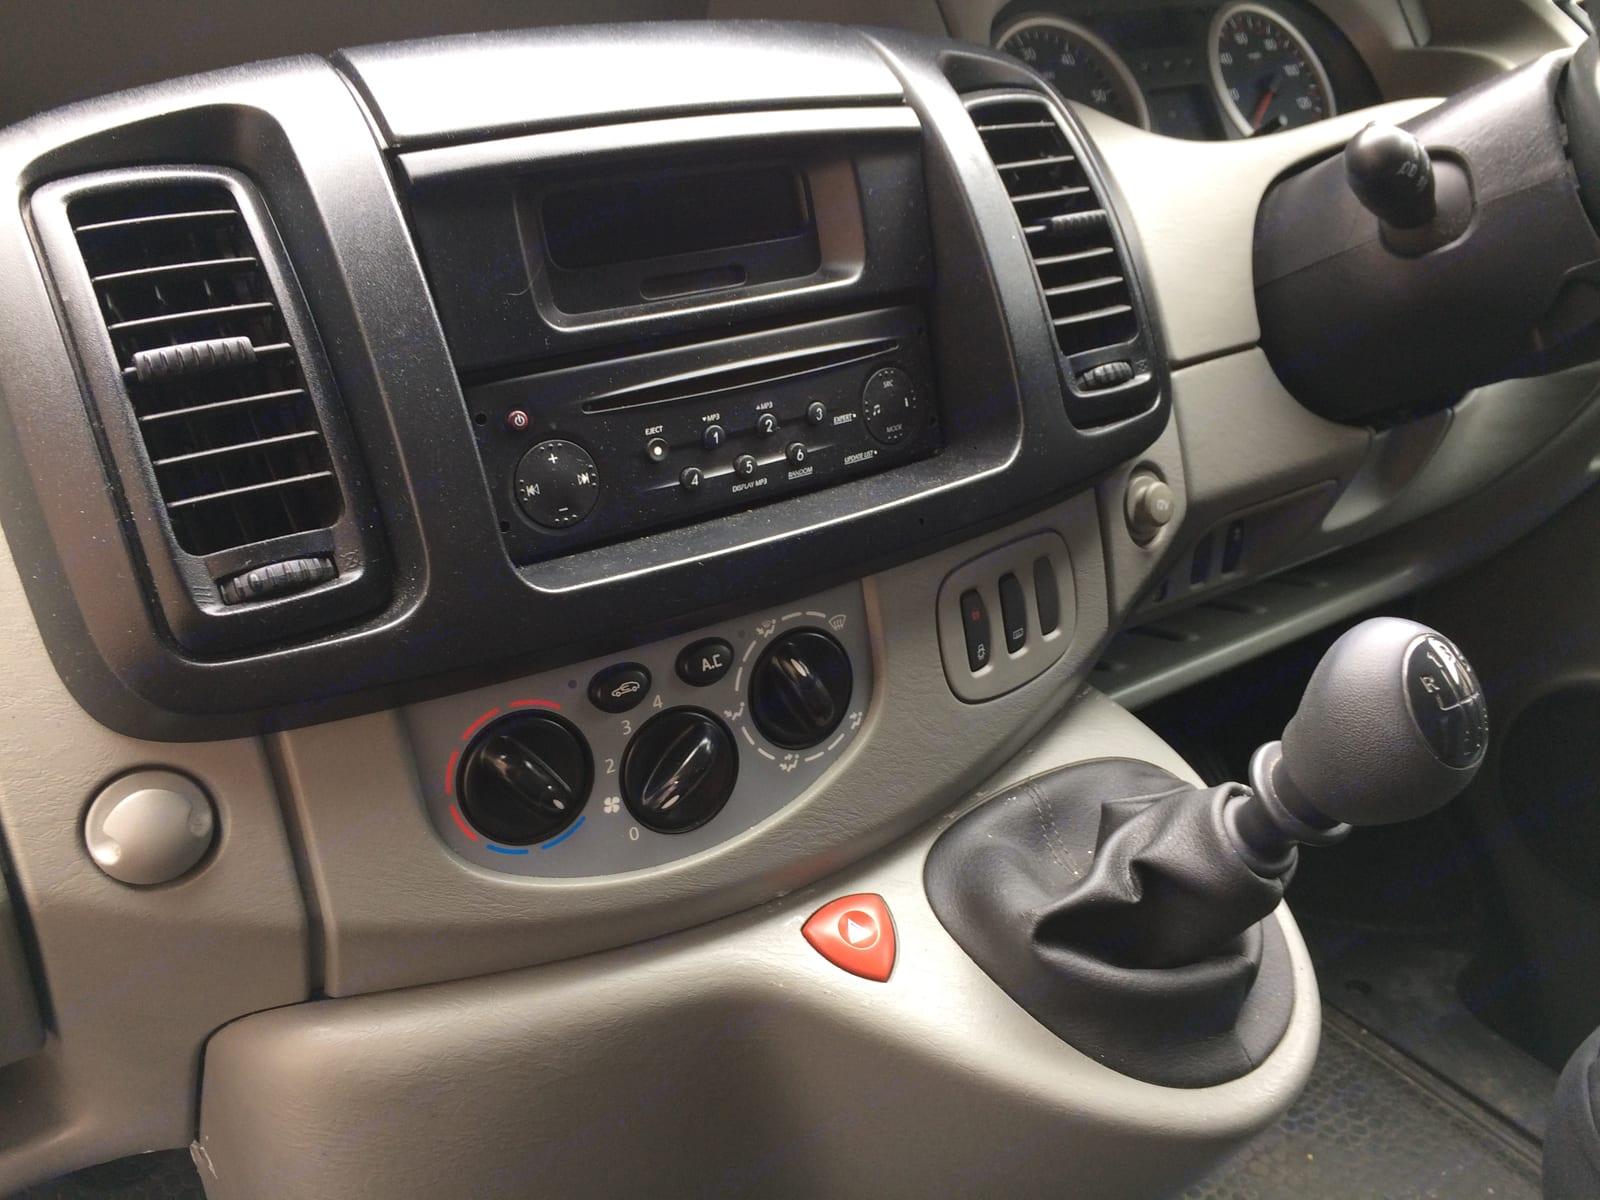 CD player, radio and AC in cab.. Nissan Primastar 2010